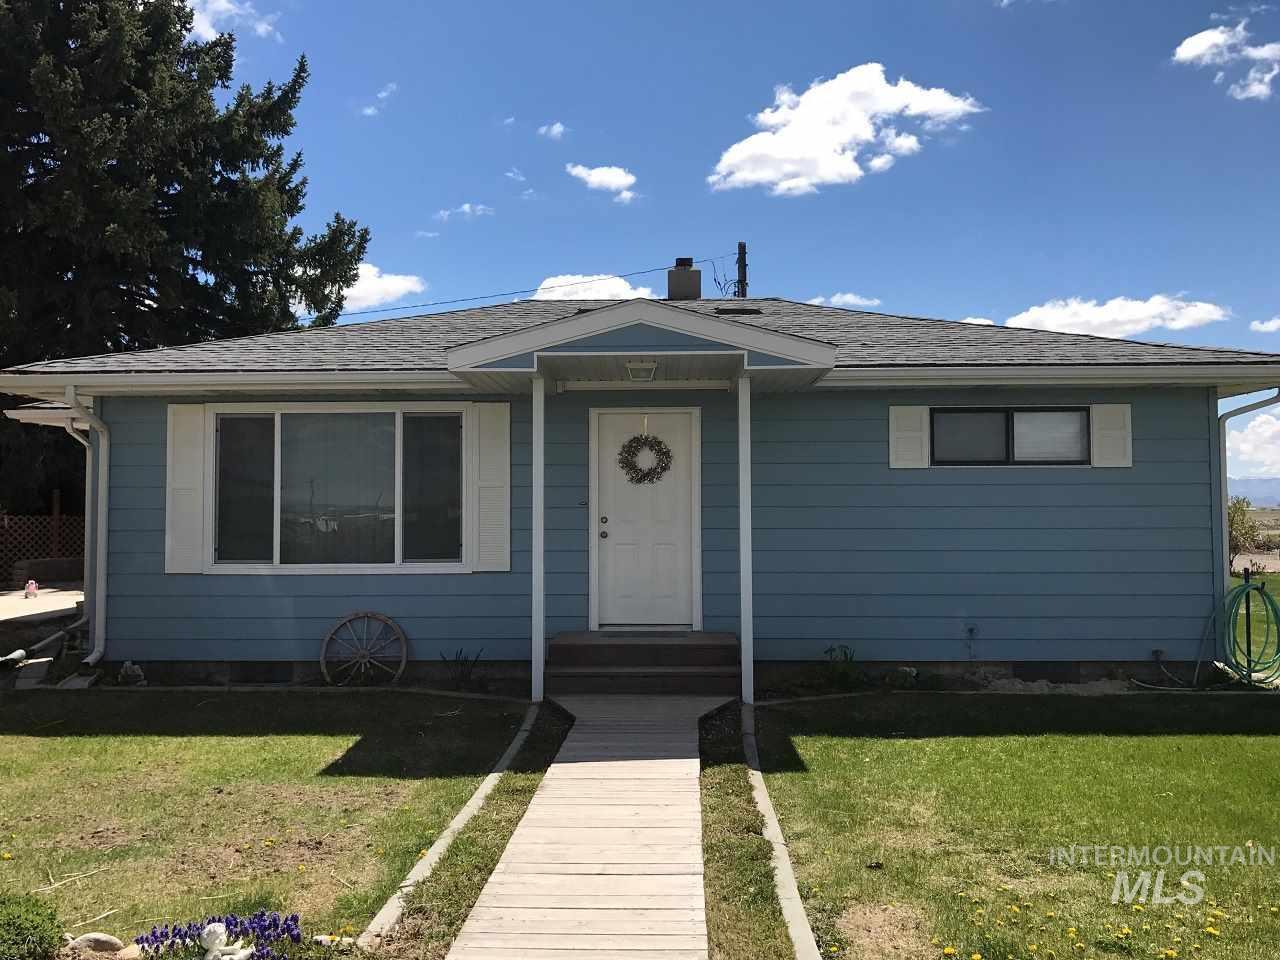 Single Family Home for Sale at 2753 E 1010 S Hazelton, Idaho 83335